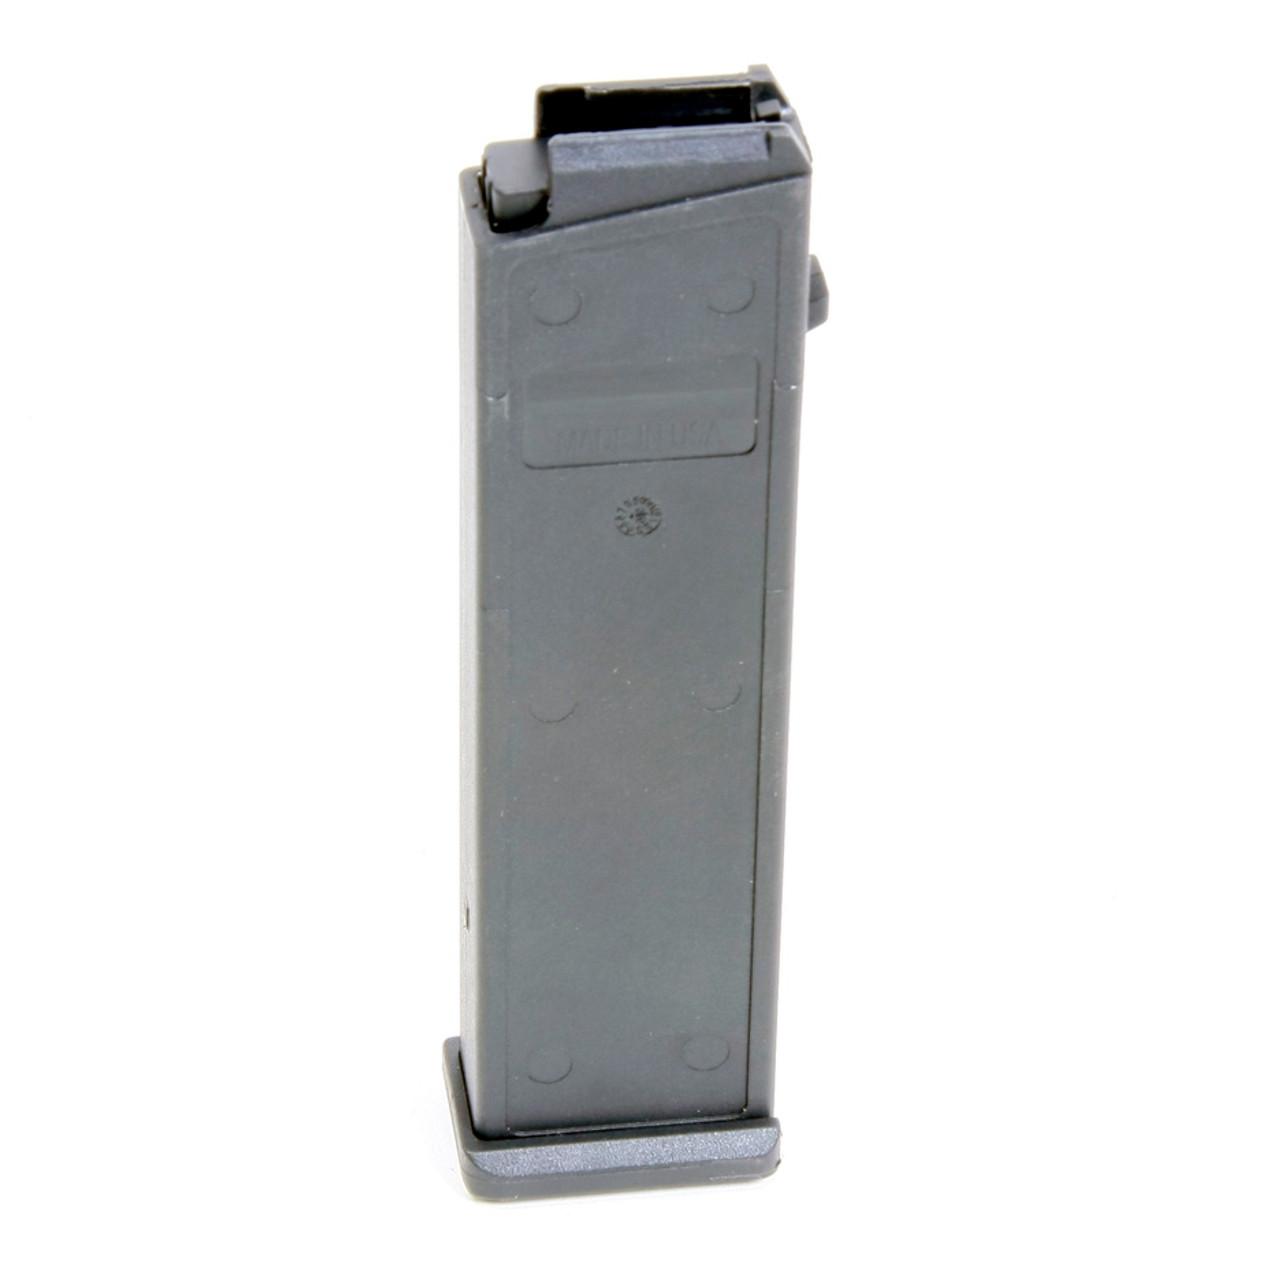 HK® USC .45 ACP Carbine (10) Rd - Black Polymer